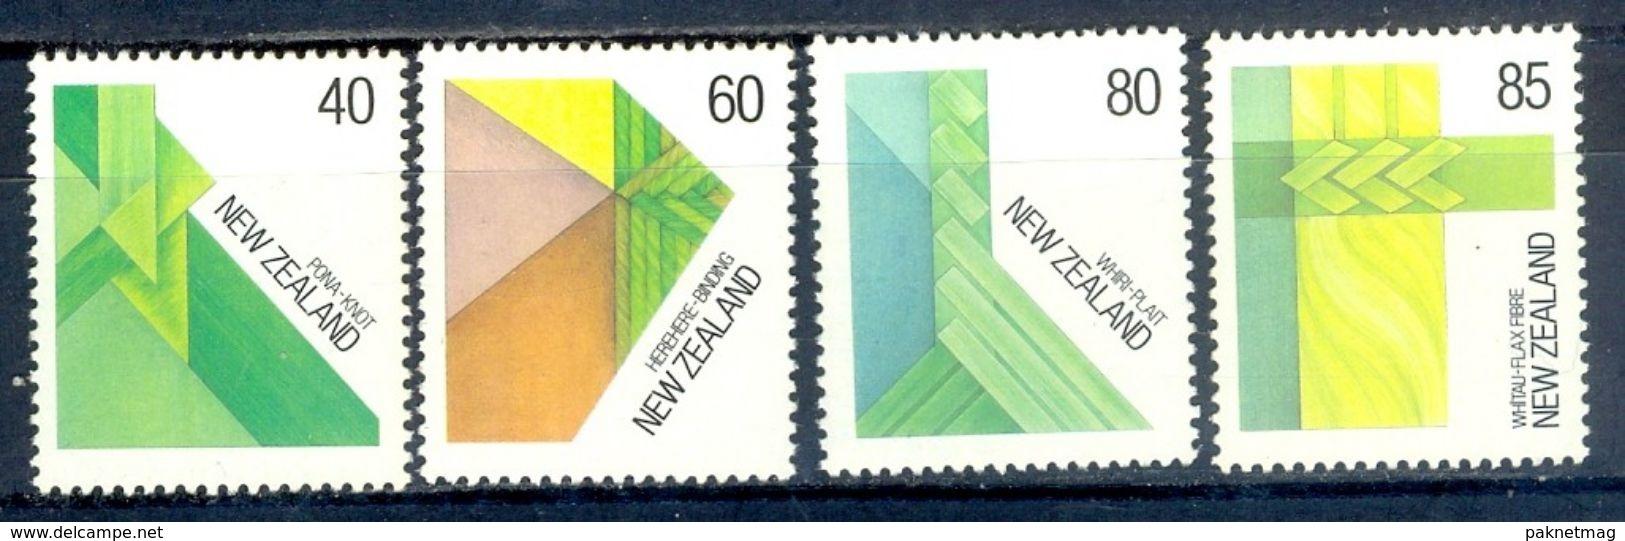 S103- New Zealand 1987. 40c Knot, 60c Binding, 80c Plait And 85c Flax Fiber Maori Fiber. Mint Never Hinged. - New Zealand